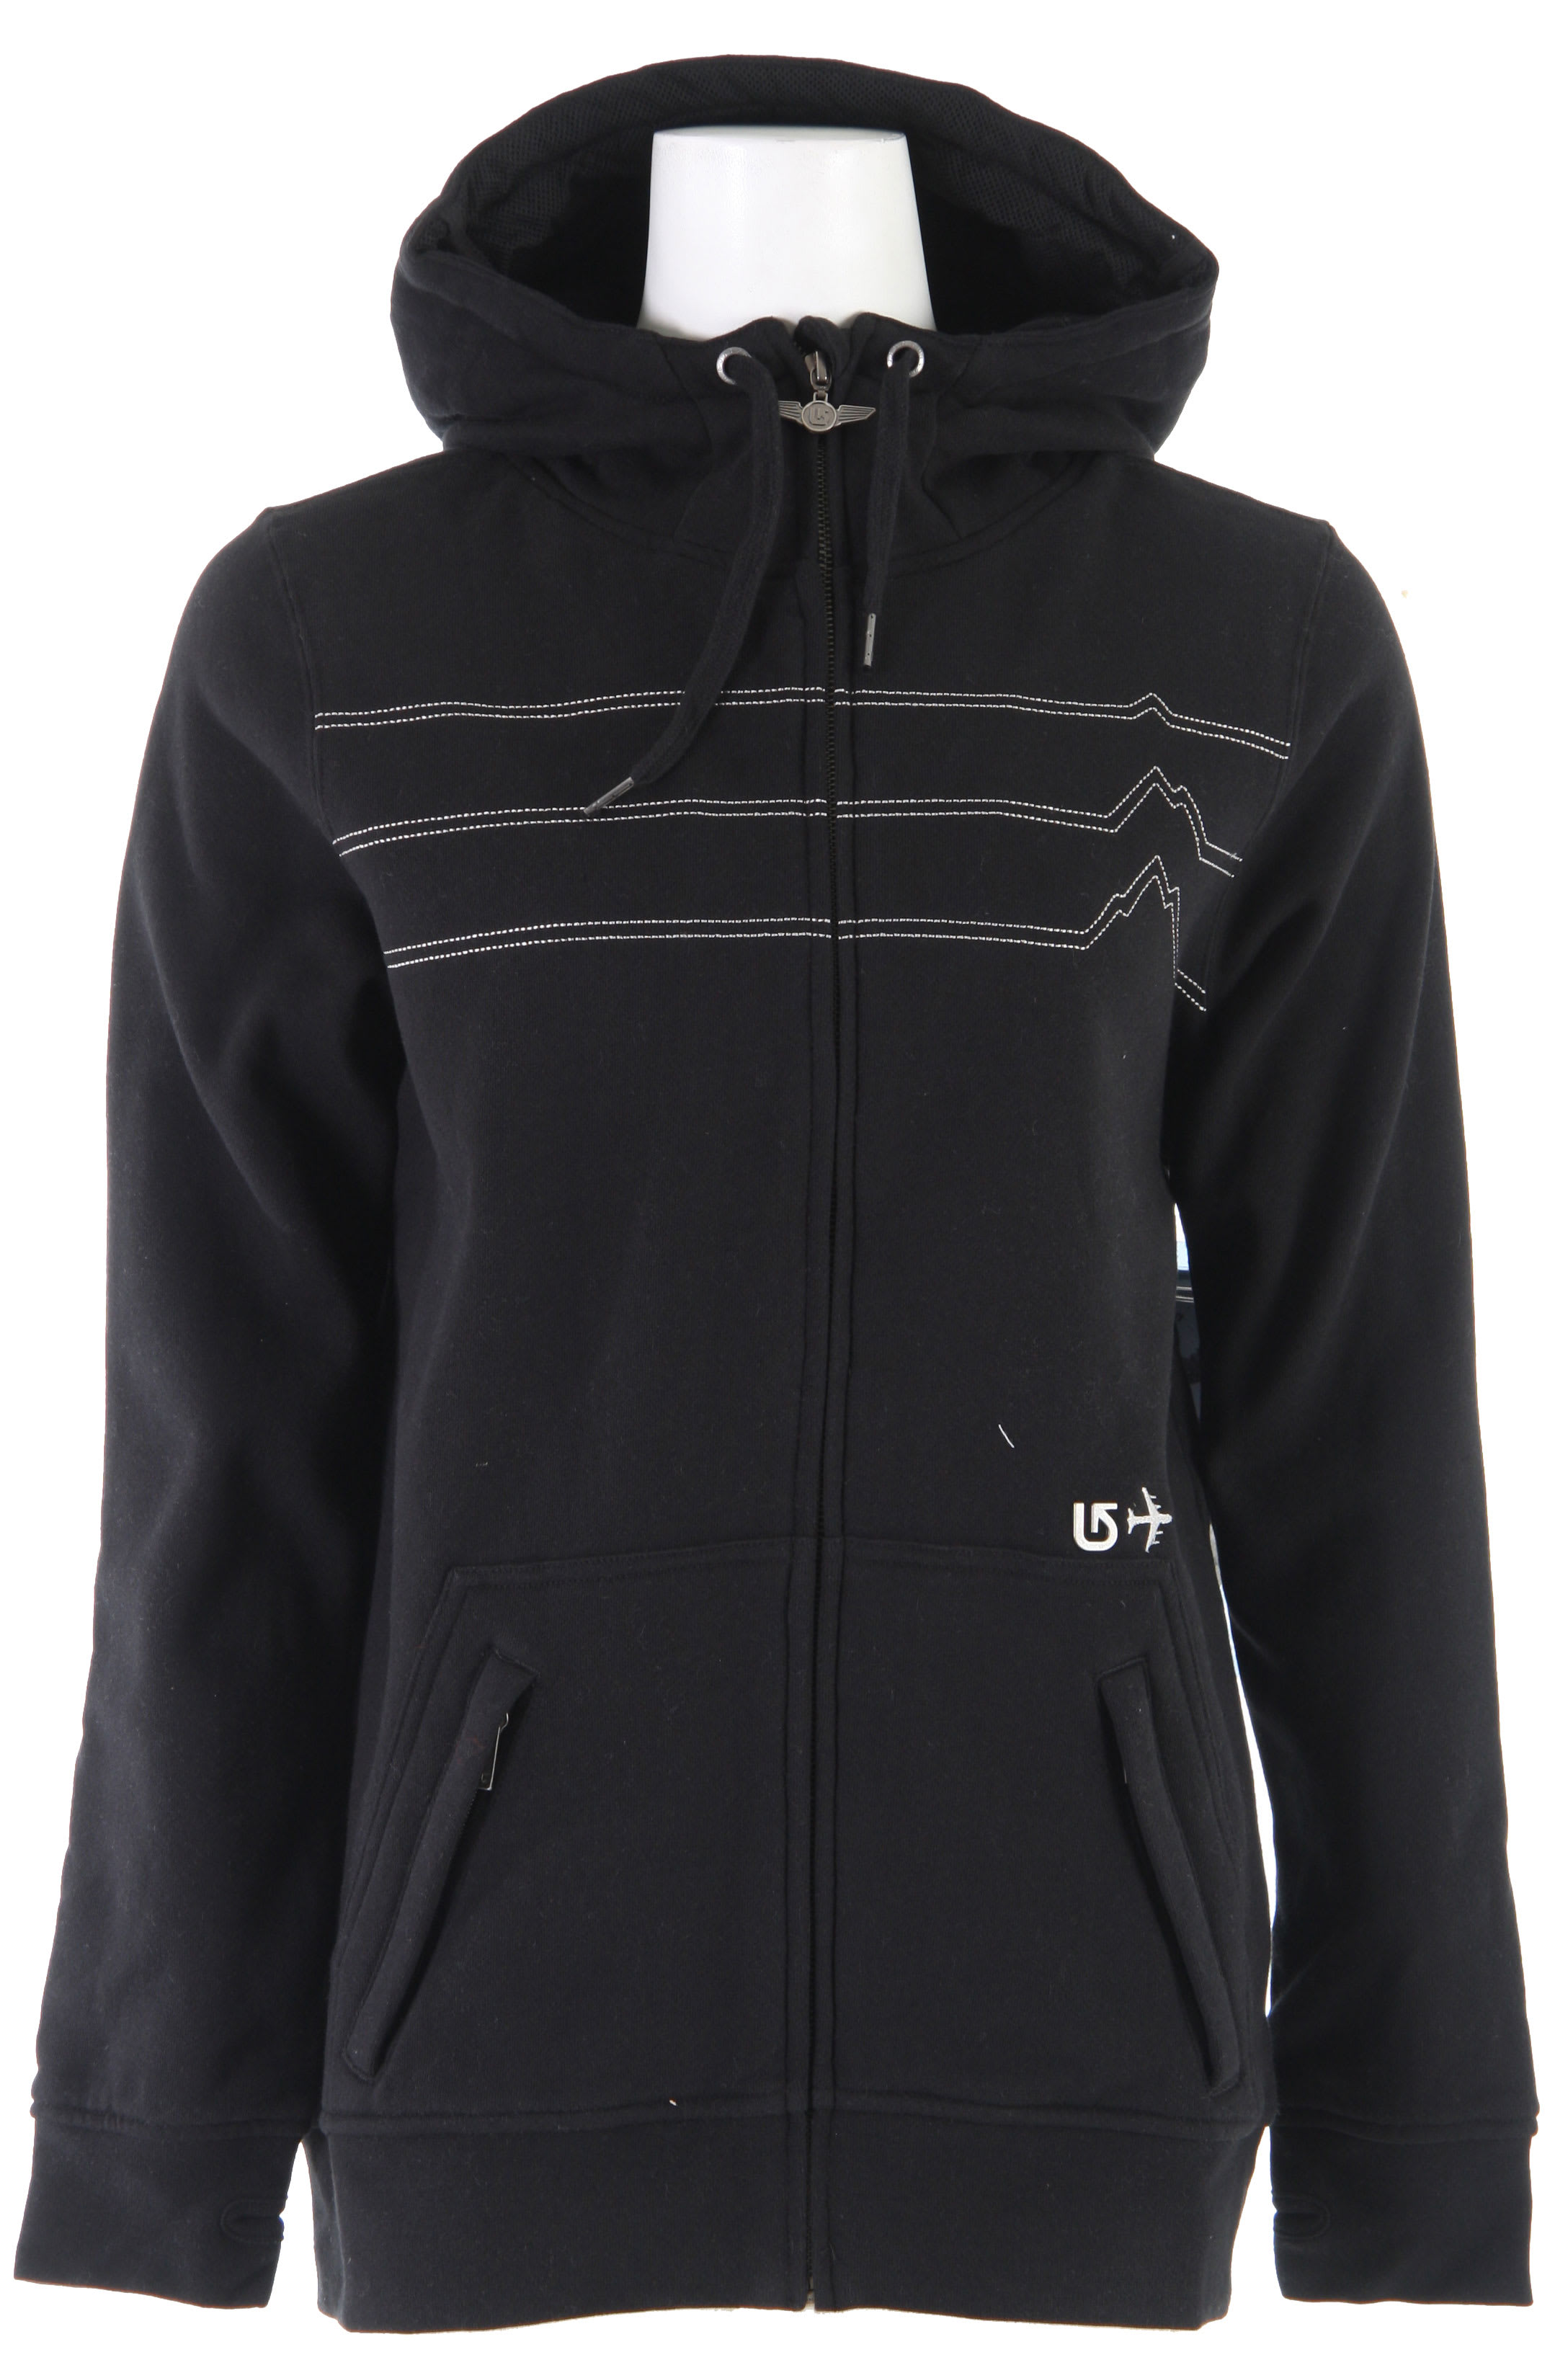 auction ue visvim yahoo burton item sophnet hoodie experiment uniform slumber sleeper fragment